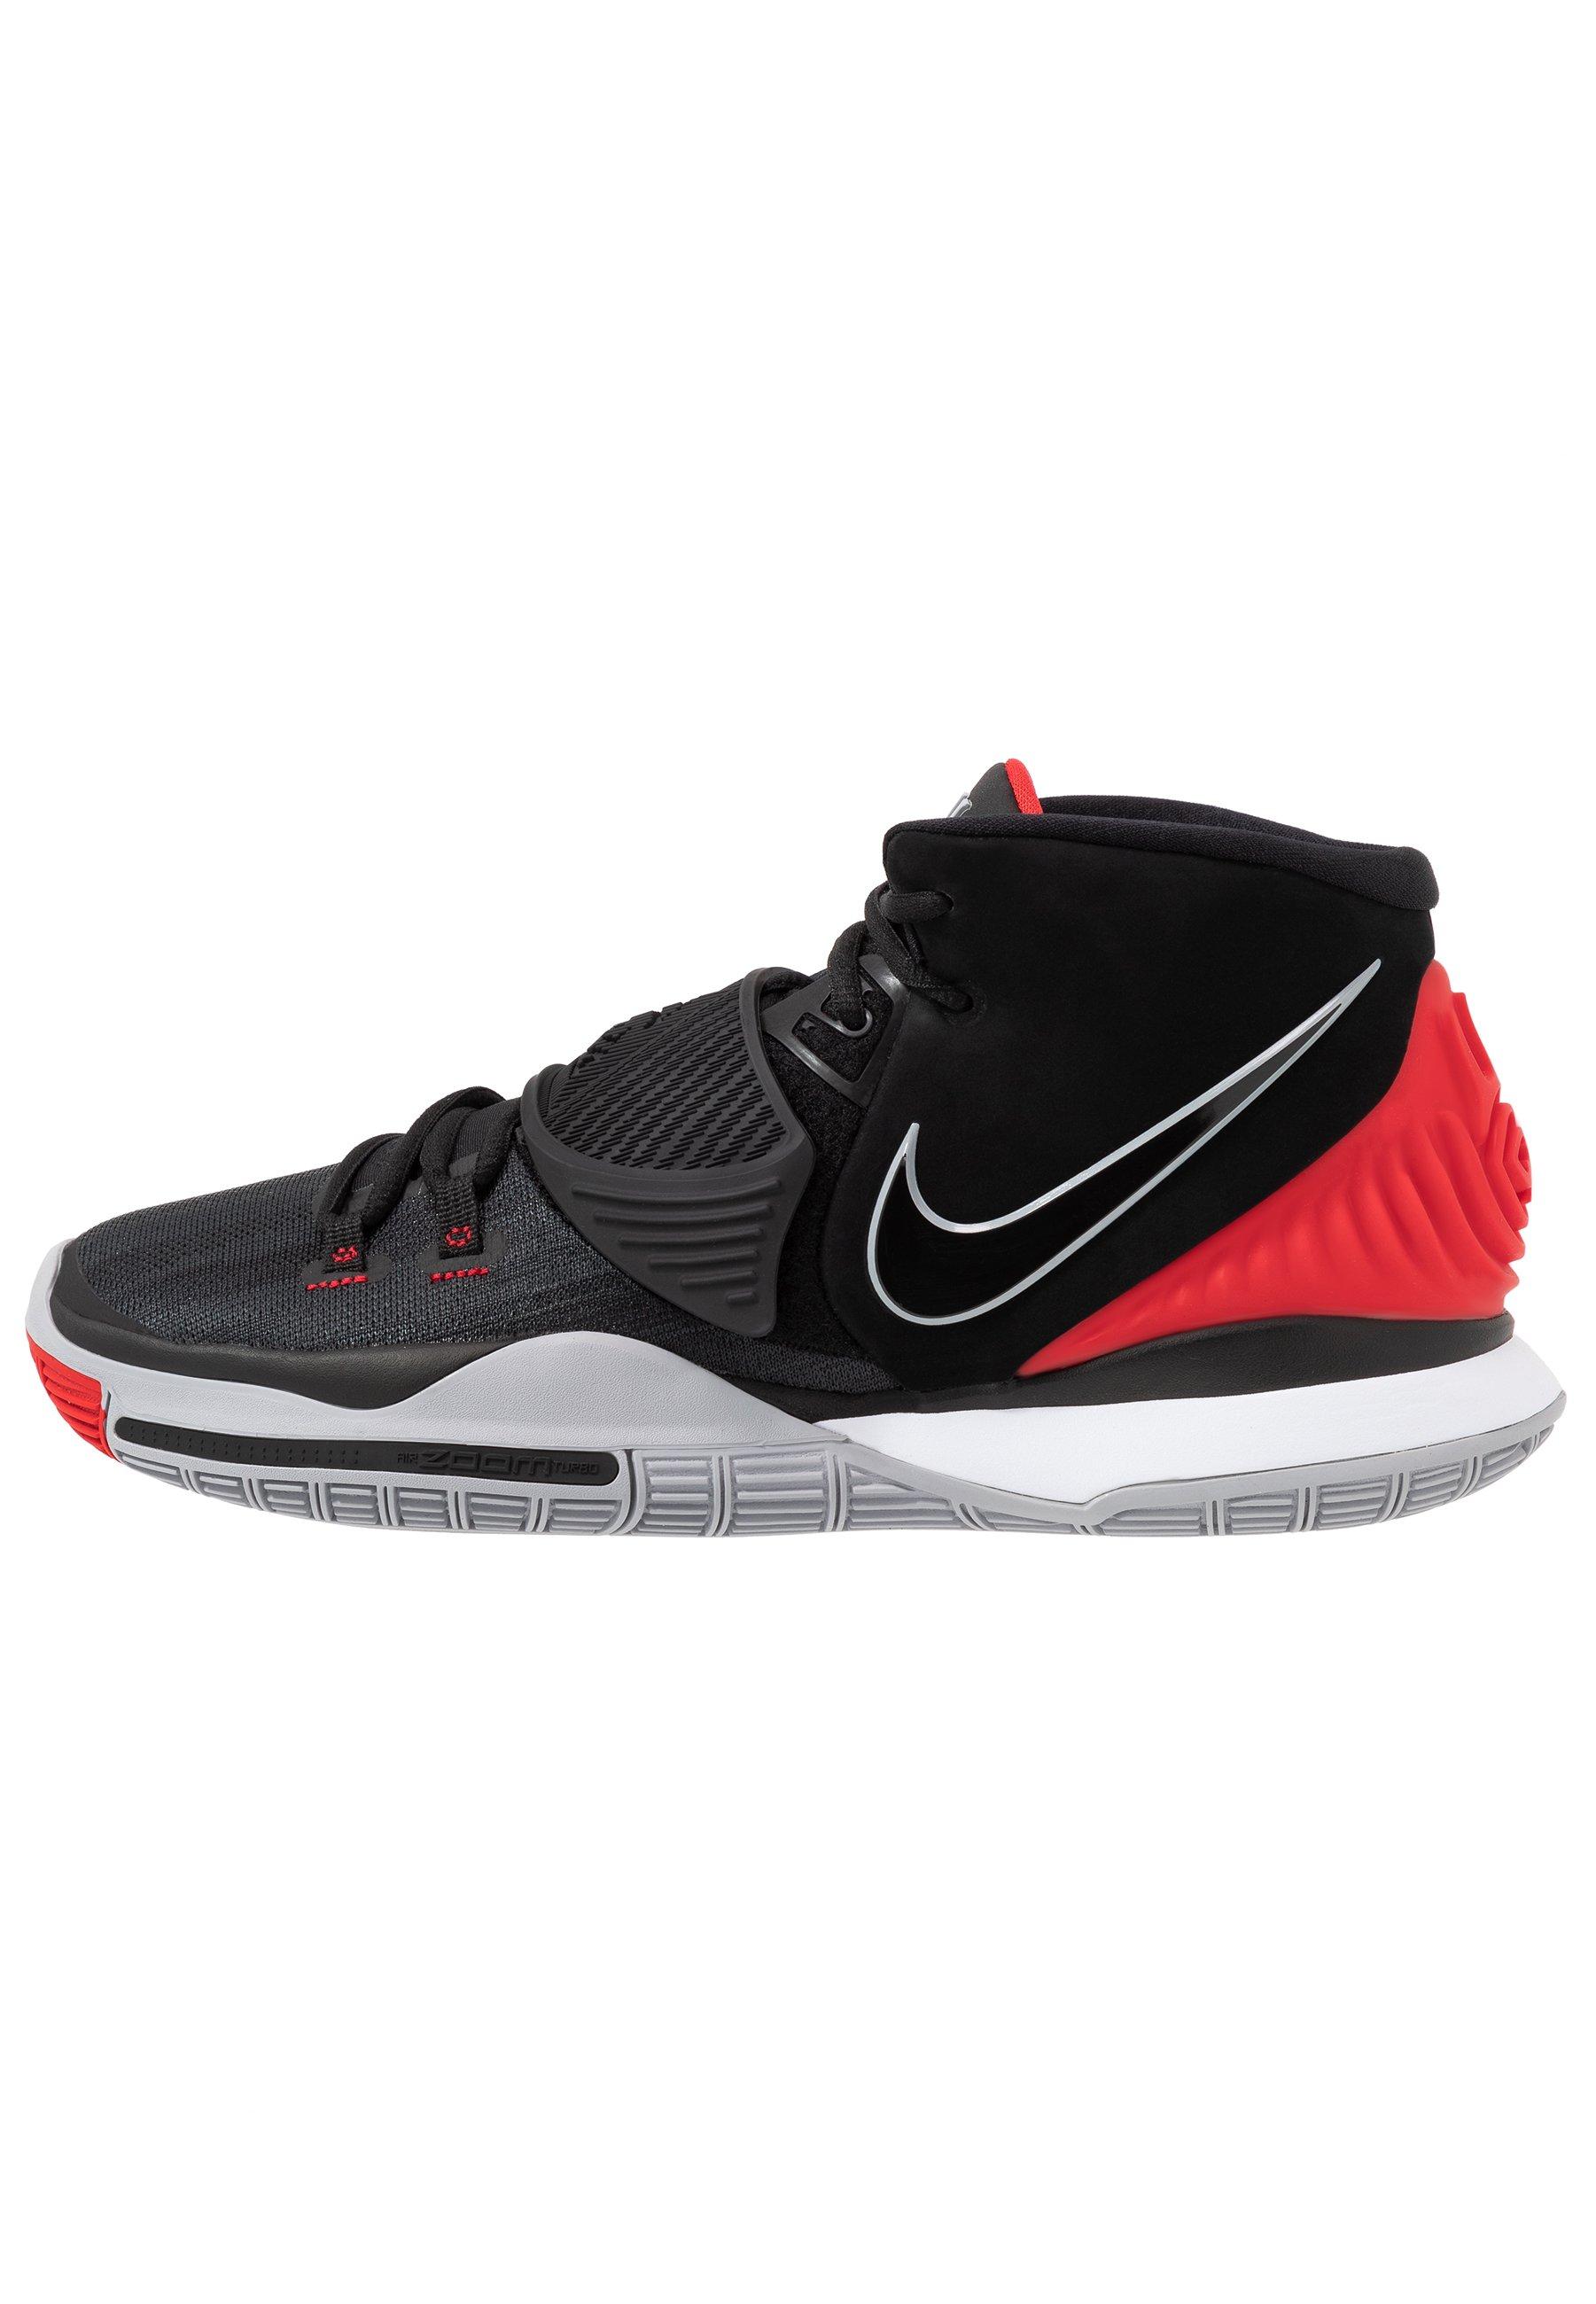 LeBron XVI Low basketsko til herre. Nike NO